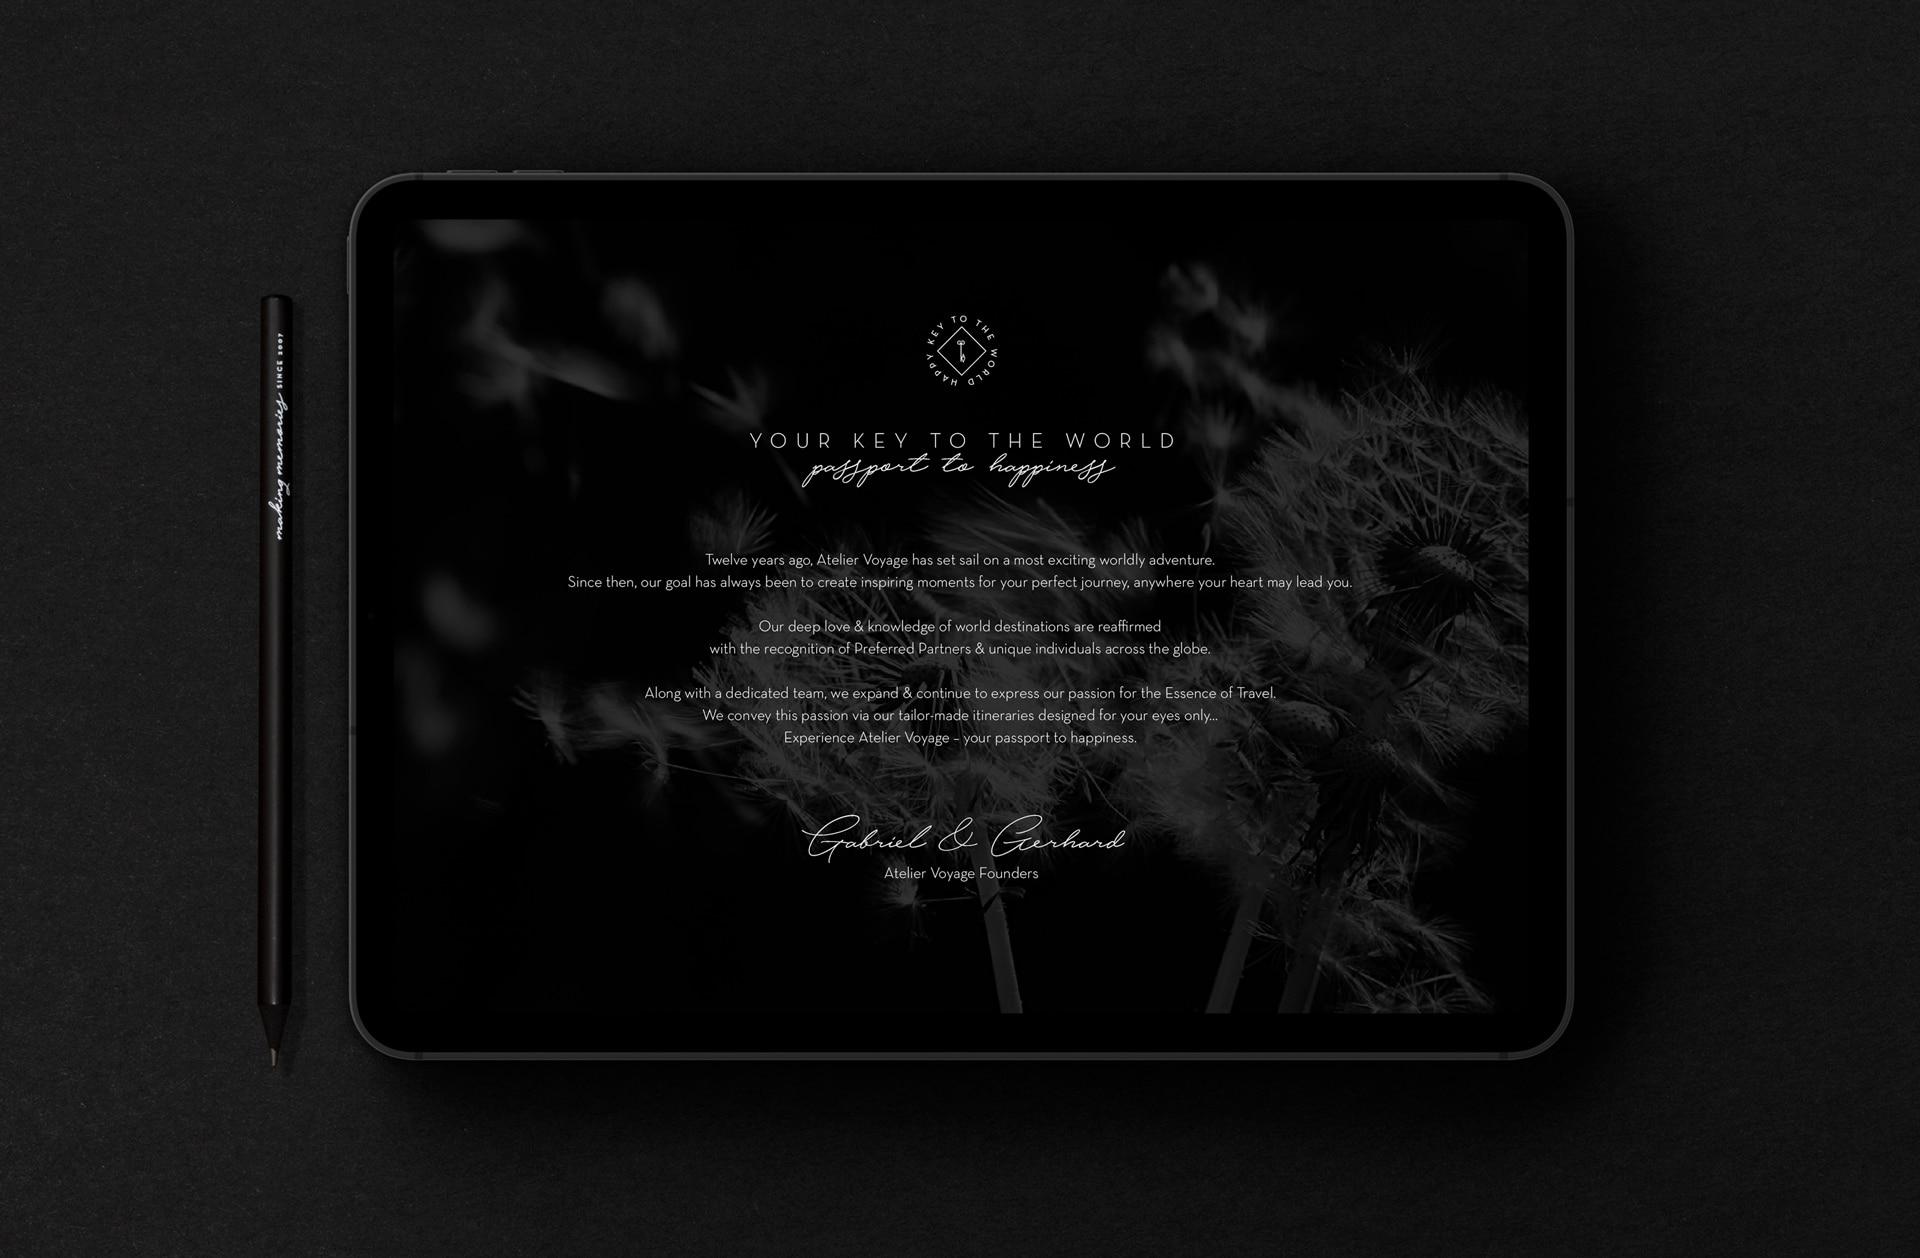 4_studiopona_ateliervoyage_branding_evolution.jpg